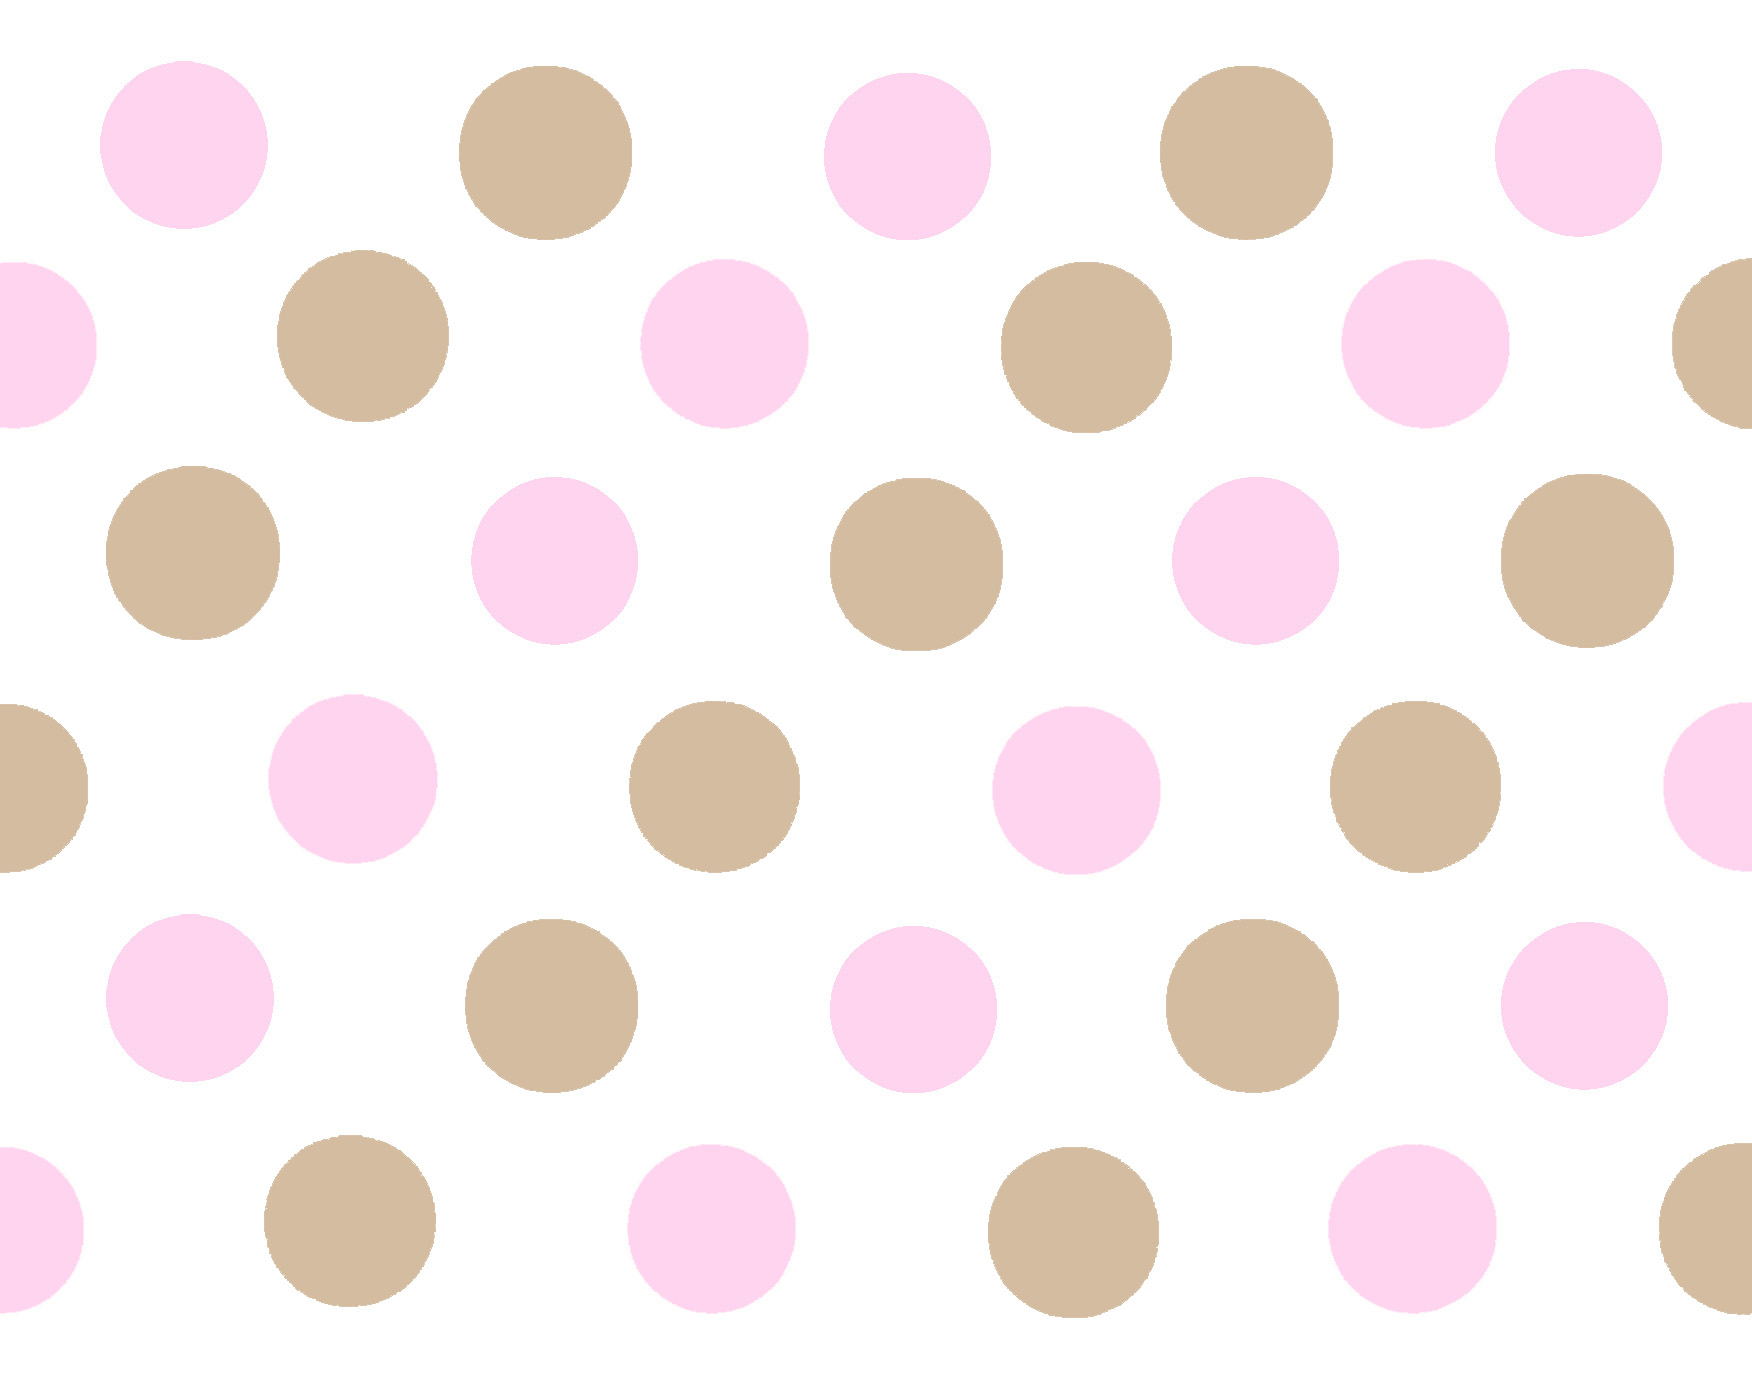 Polka Dot Wall Sticker Pink Polka Dot Wallpaper Wallpapersafari